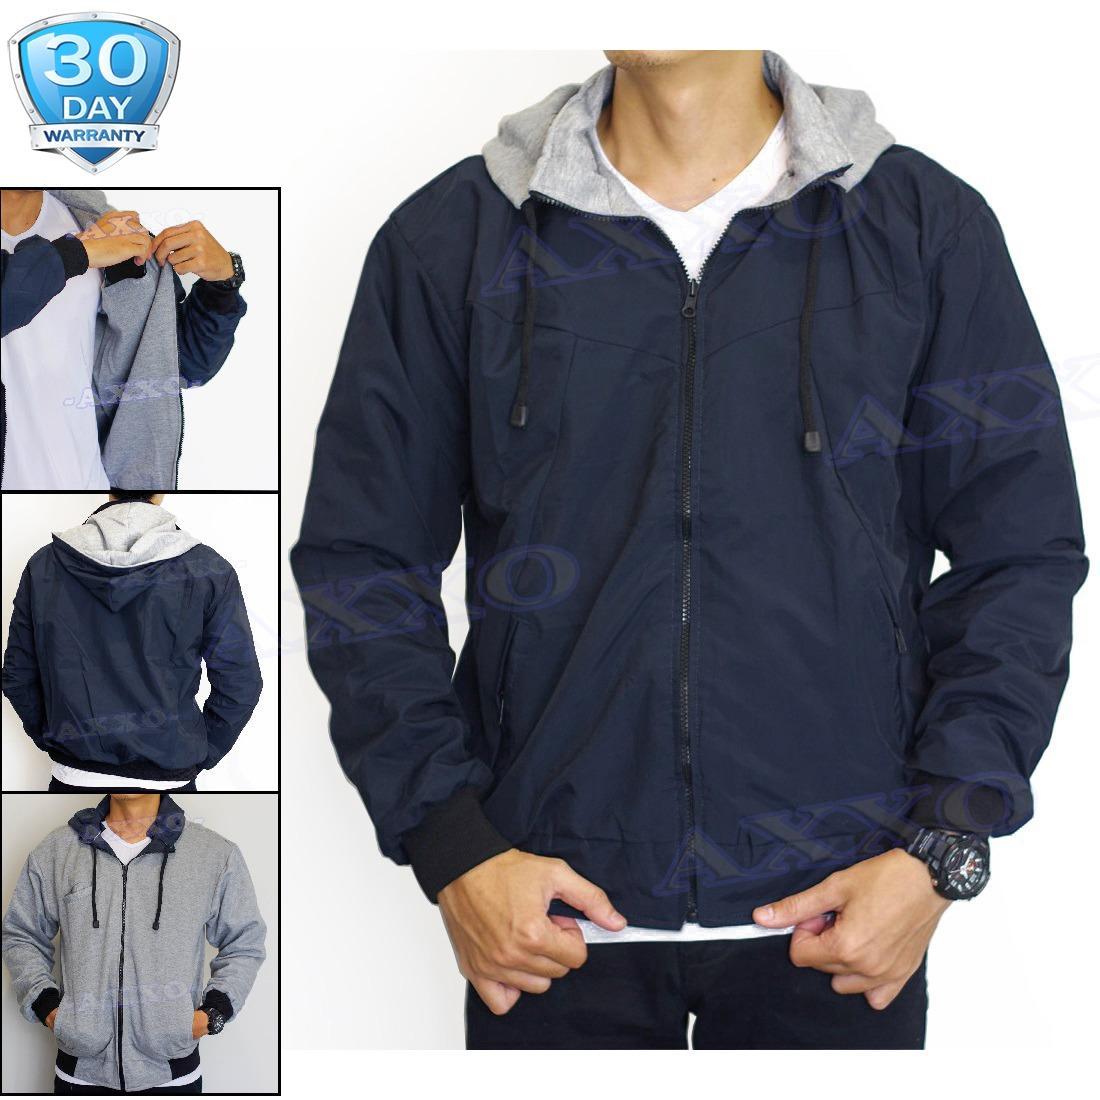 Harga Jaket Parasut Fleece 2In1 Bolak Balik Jaket Pria Biru Navy Ax002 Asli Jaket Pria